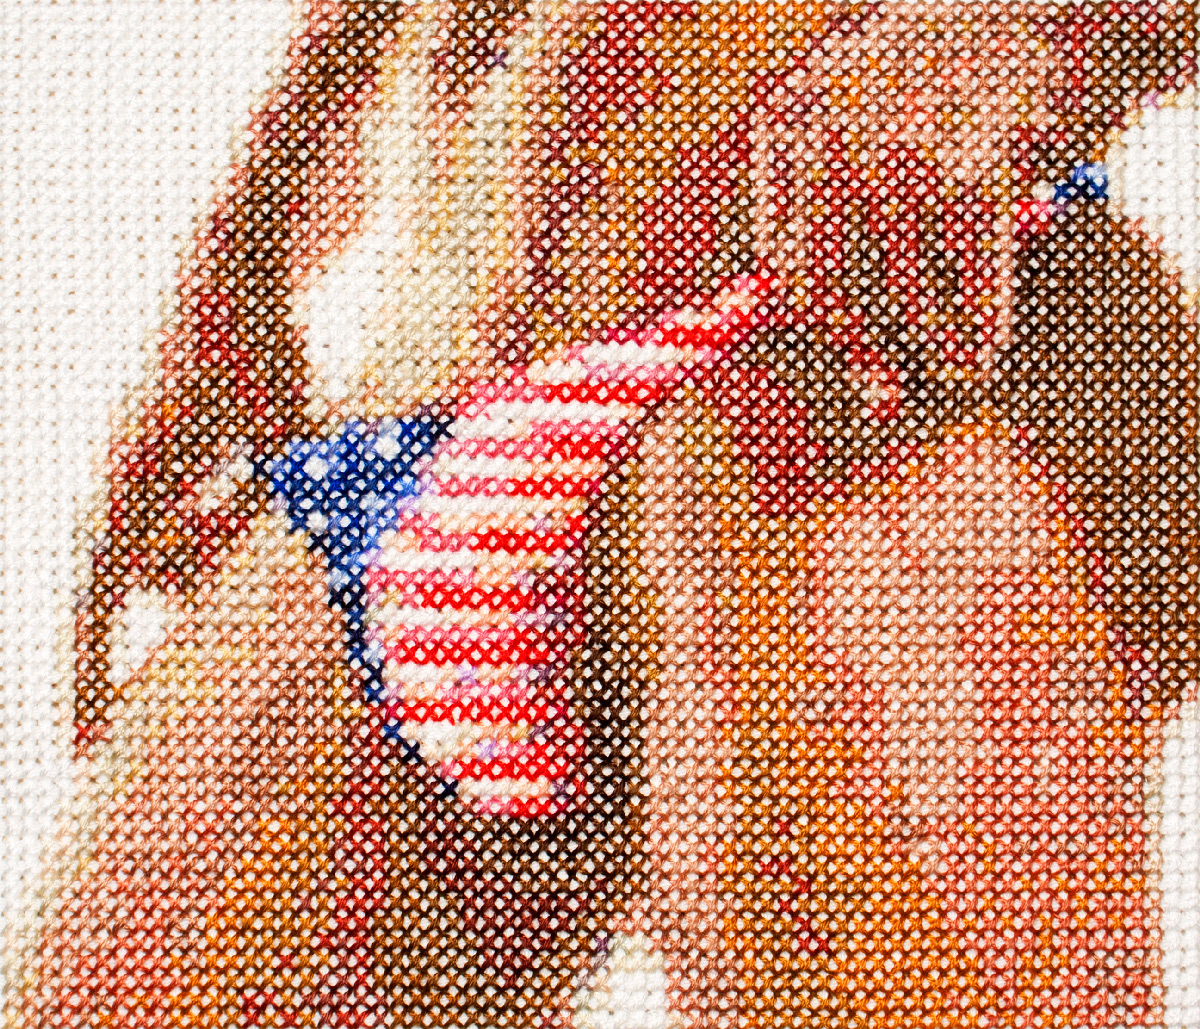 american junk 3   Cotton thread on aida cloth  5.2 x 5.8 inches  2017